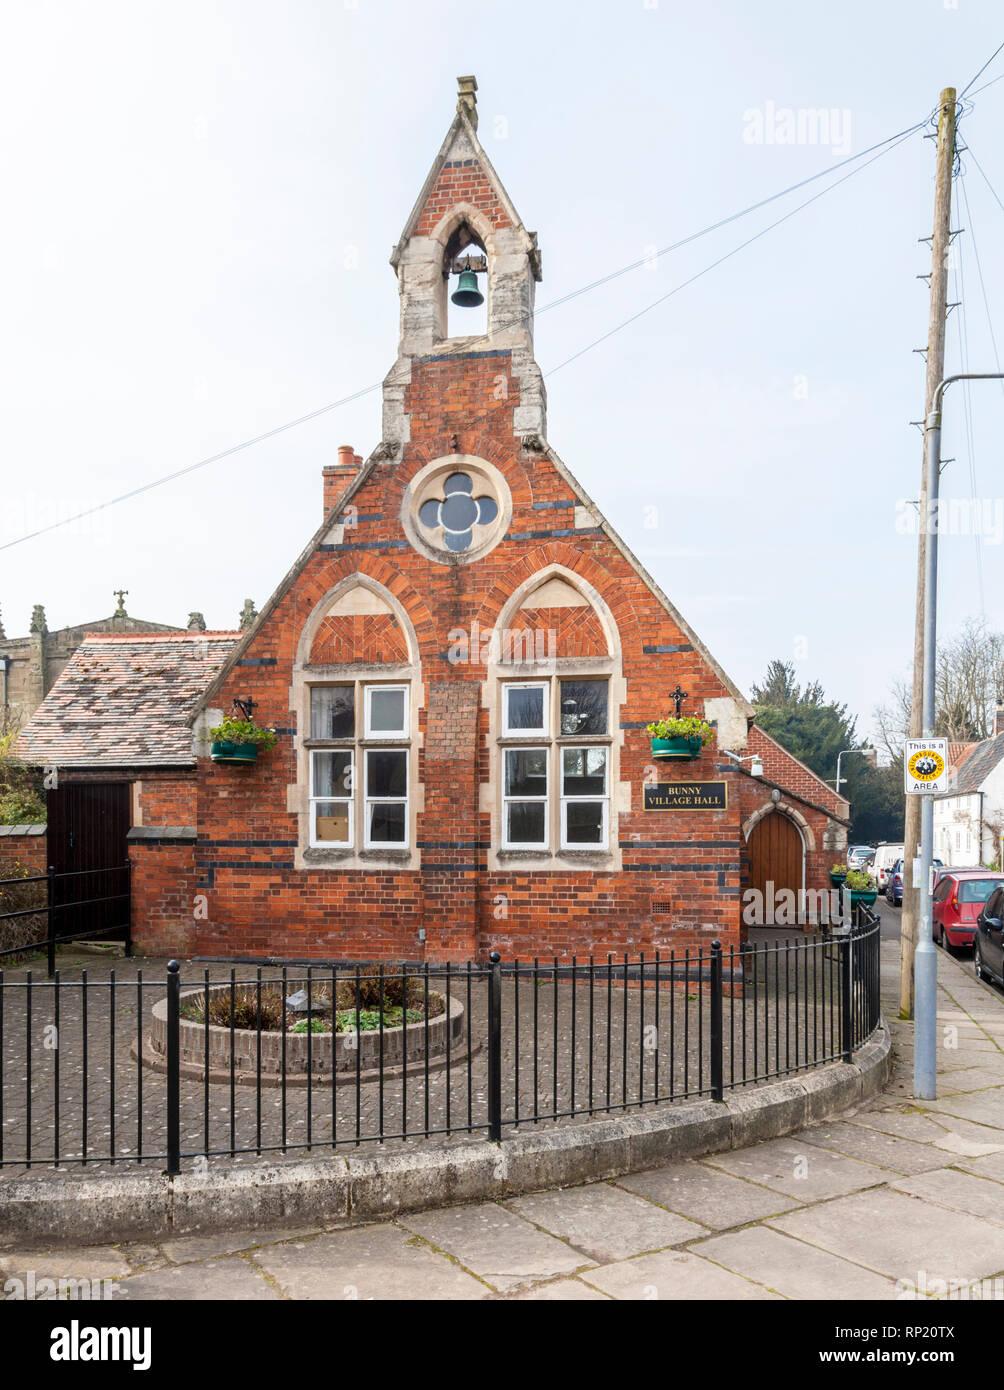 The Village Hall, Bunny, Nottinghamshire, England, UK - Stock Image